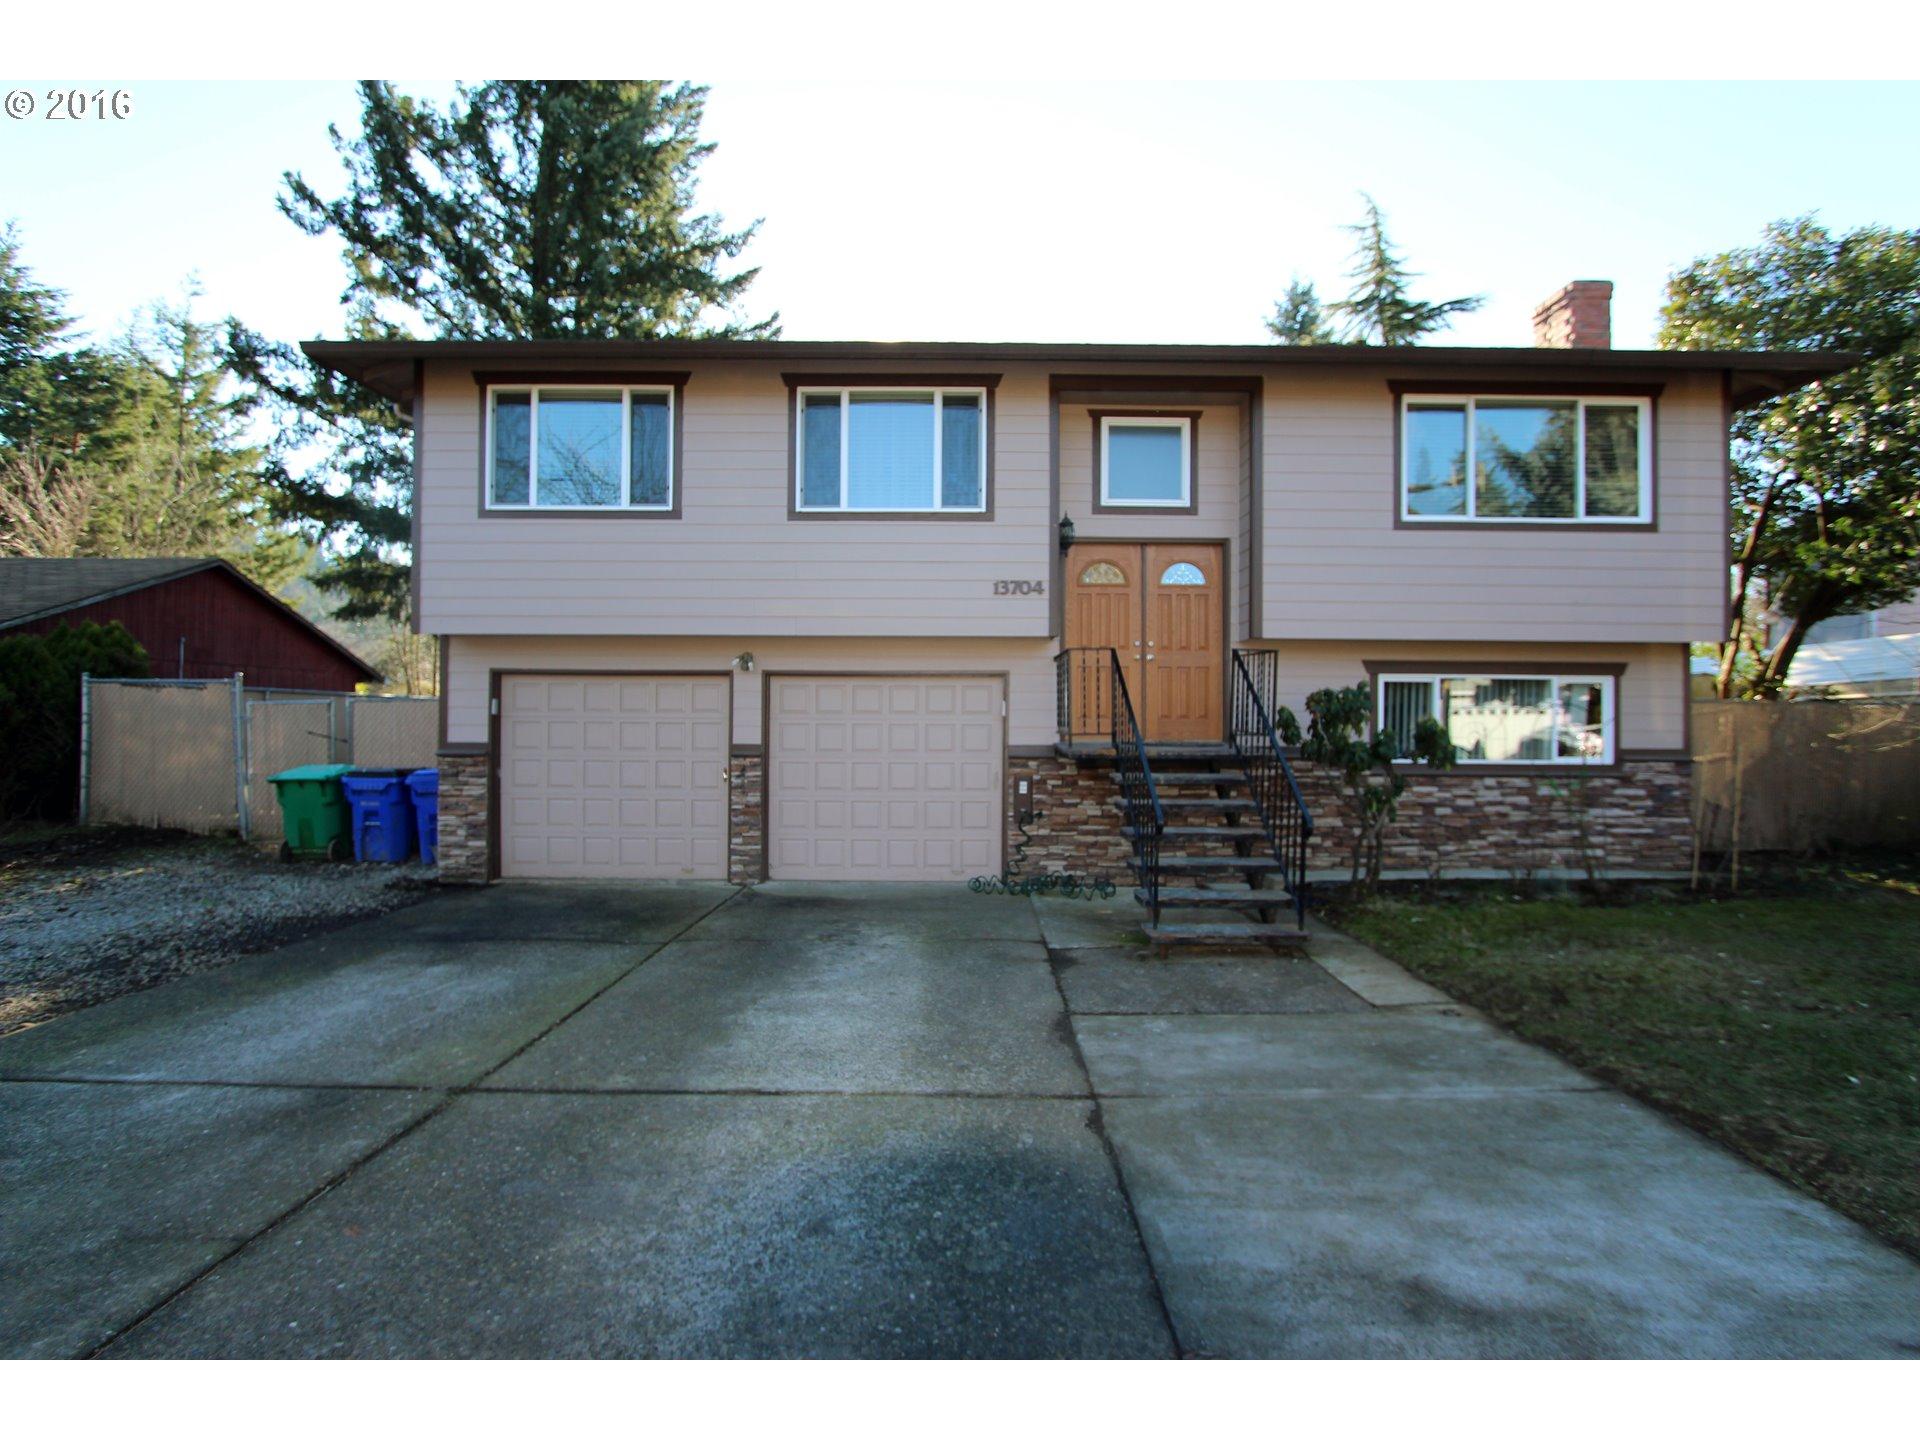 13704 SE Cora St, Portland, OR